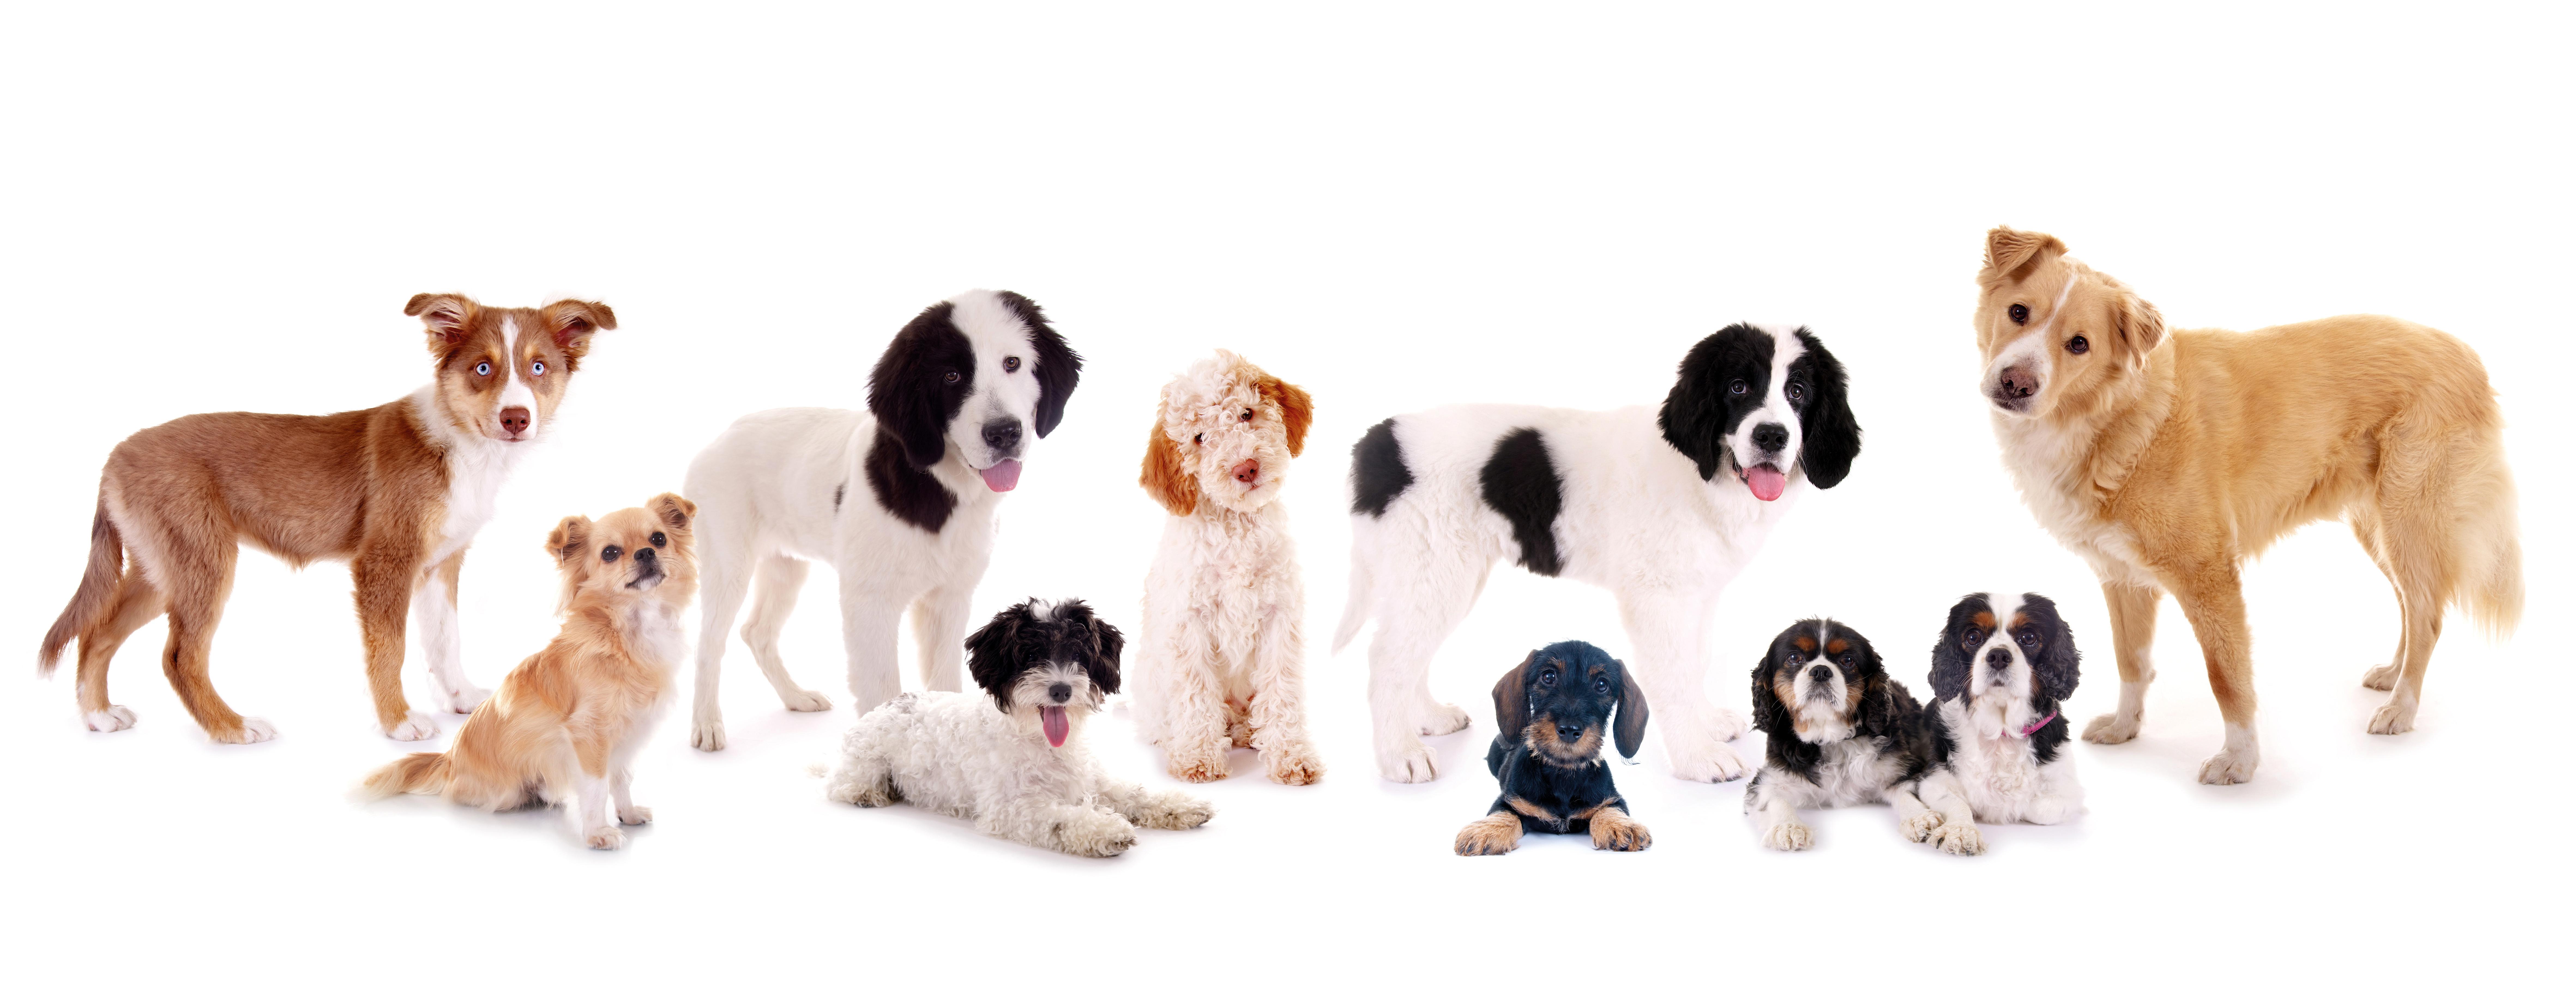 zehn Hunde, verschiedene Rassen Terrier, Mischling, Lagotto, Dackel, Bernhadiner